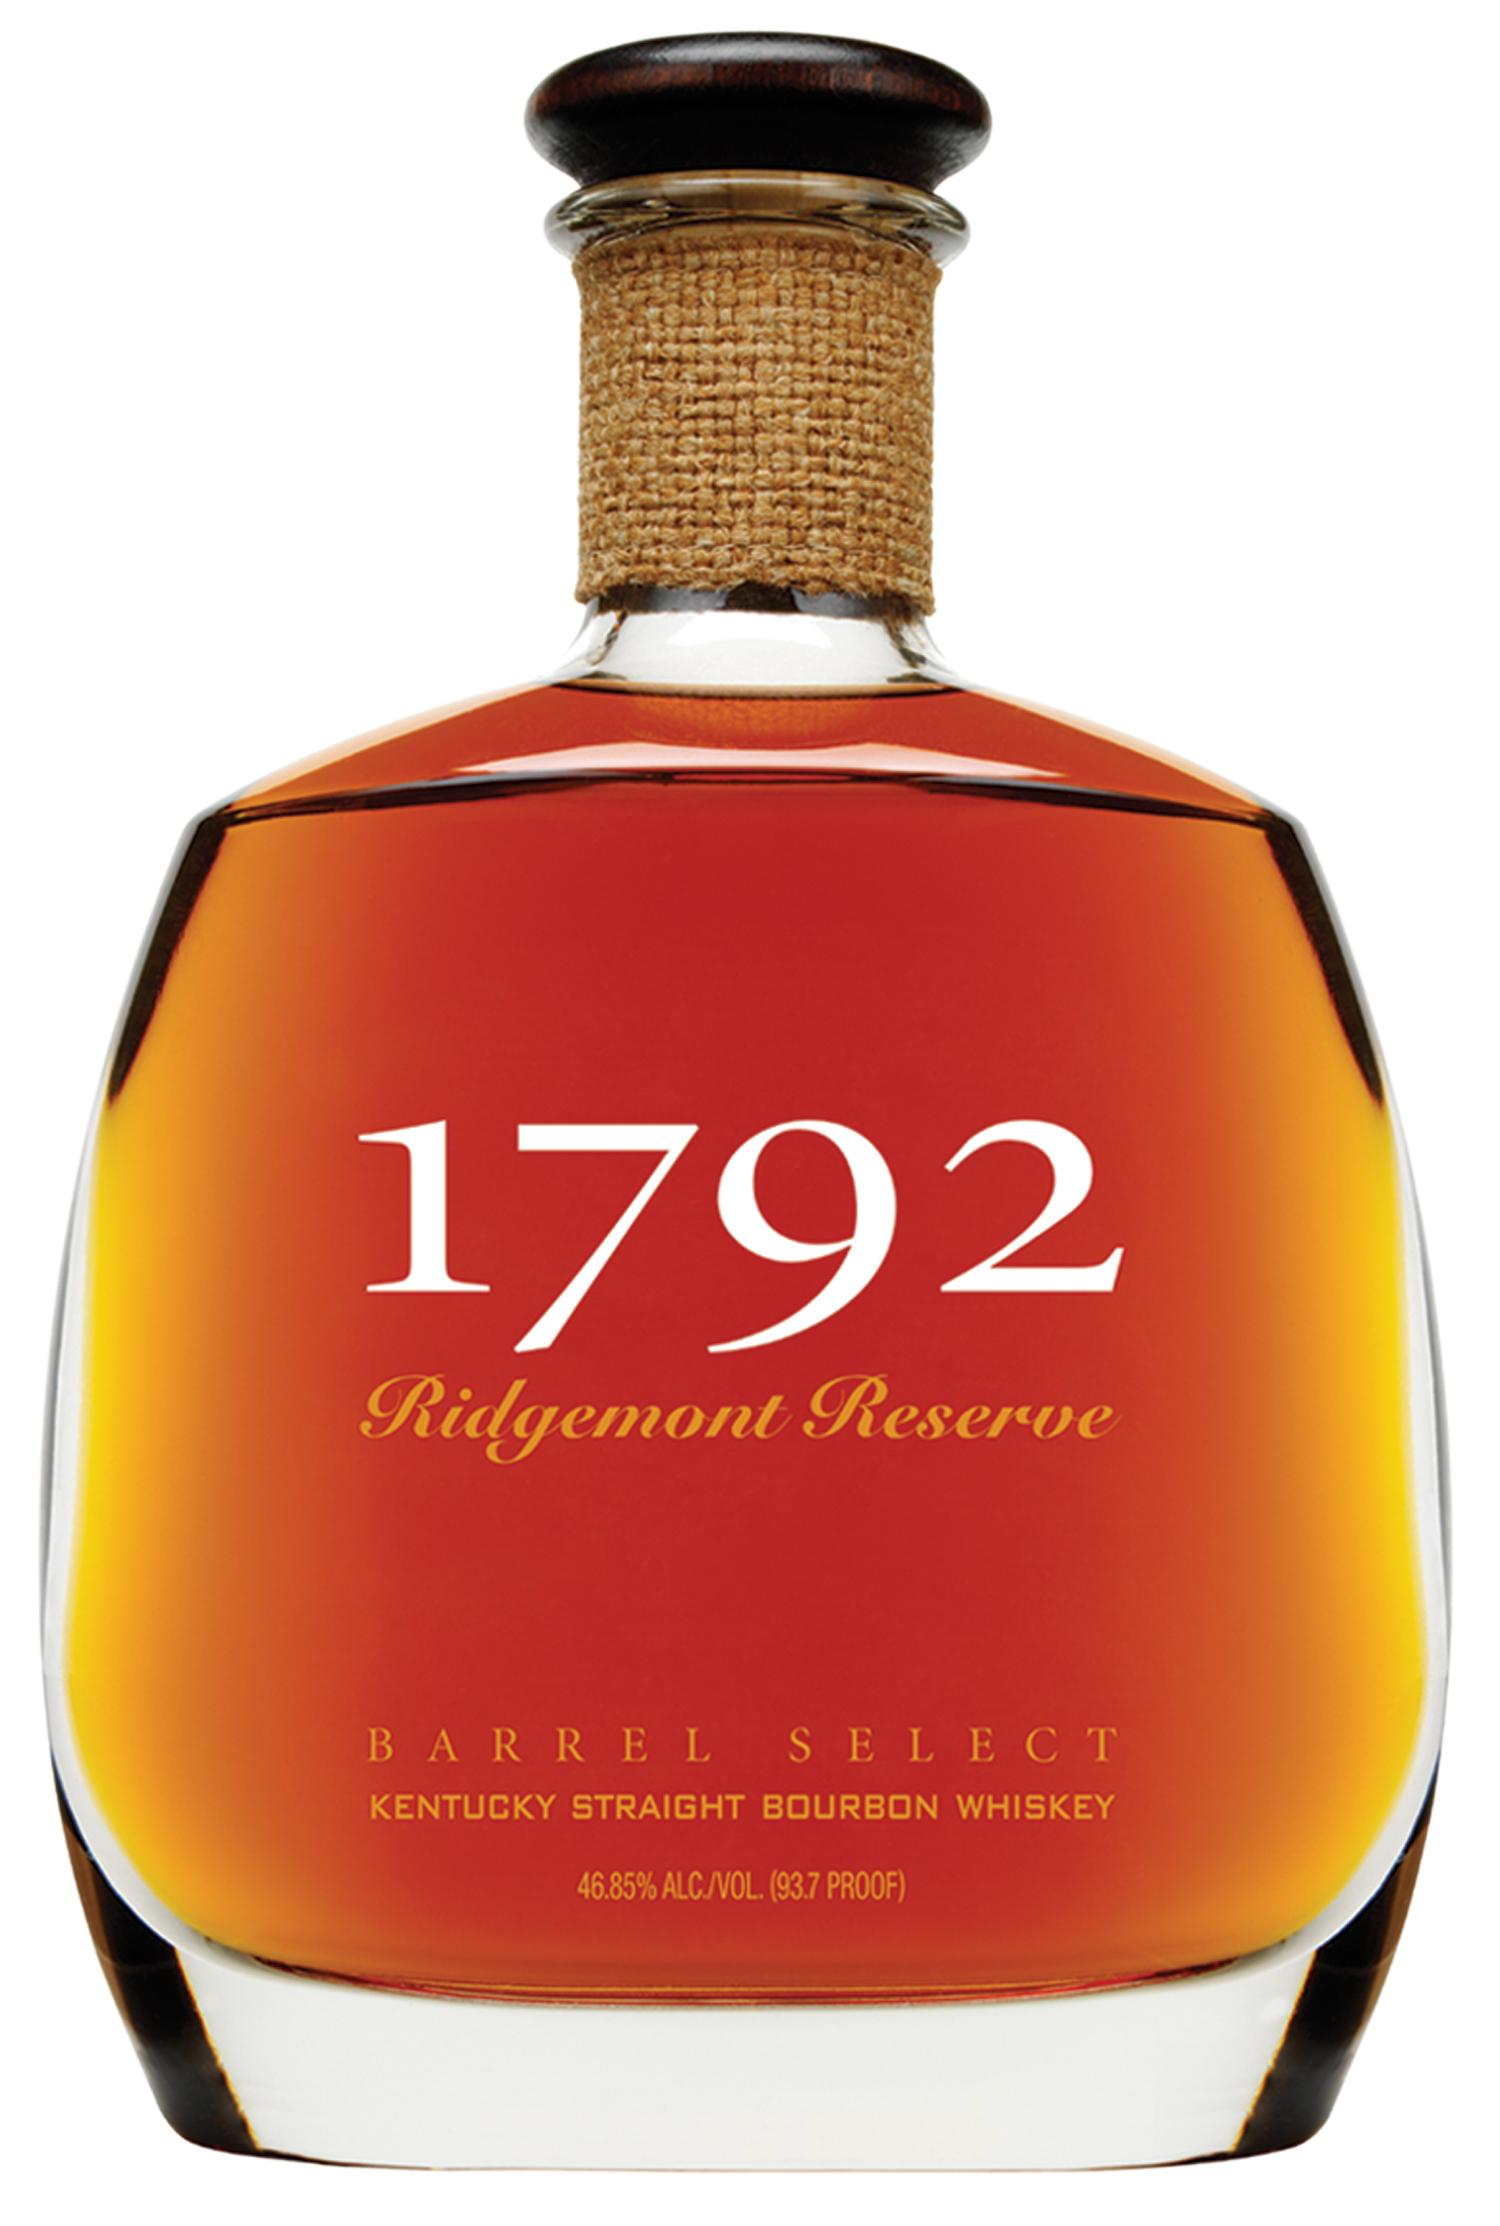 1792 Ridgemont Reserve Small Batch Bourbon 8 year old : Liquor Depot;  Edmonton